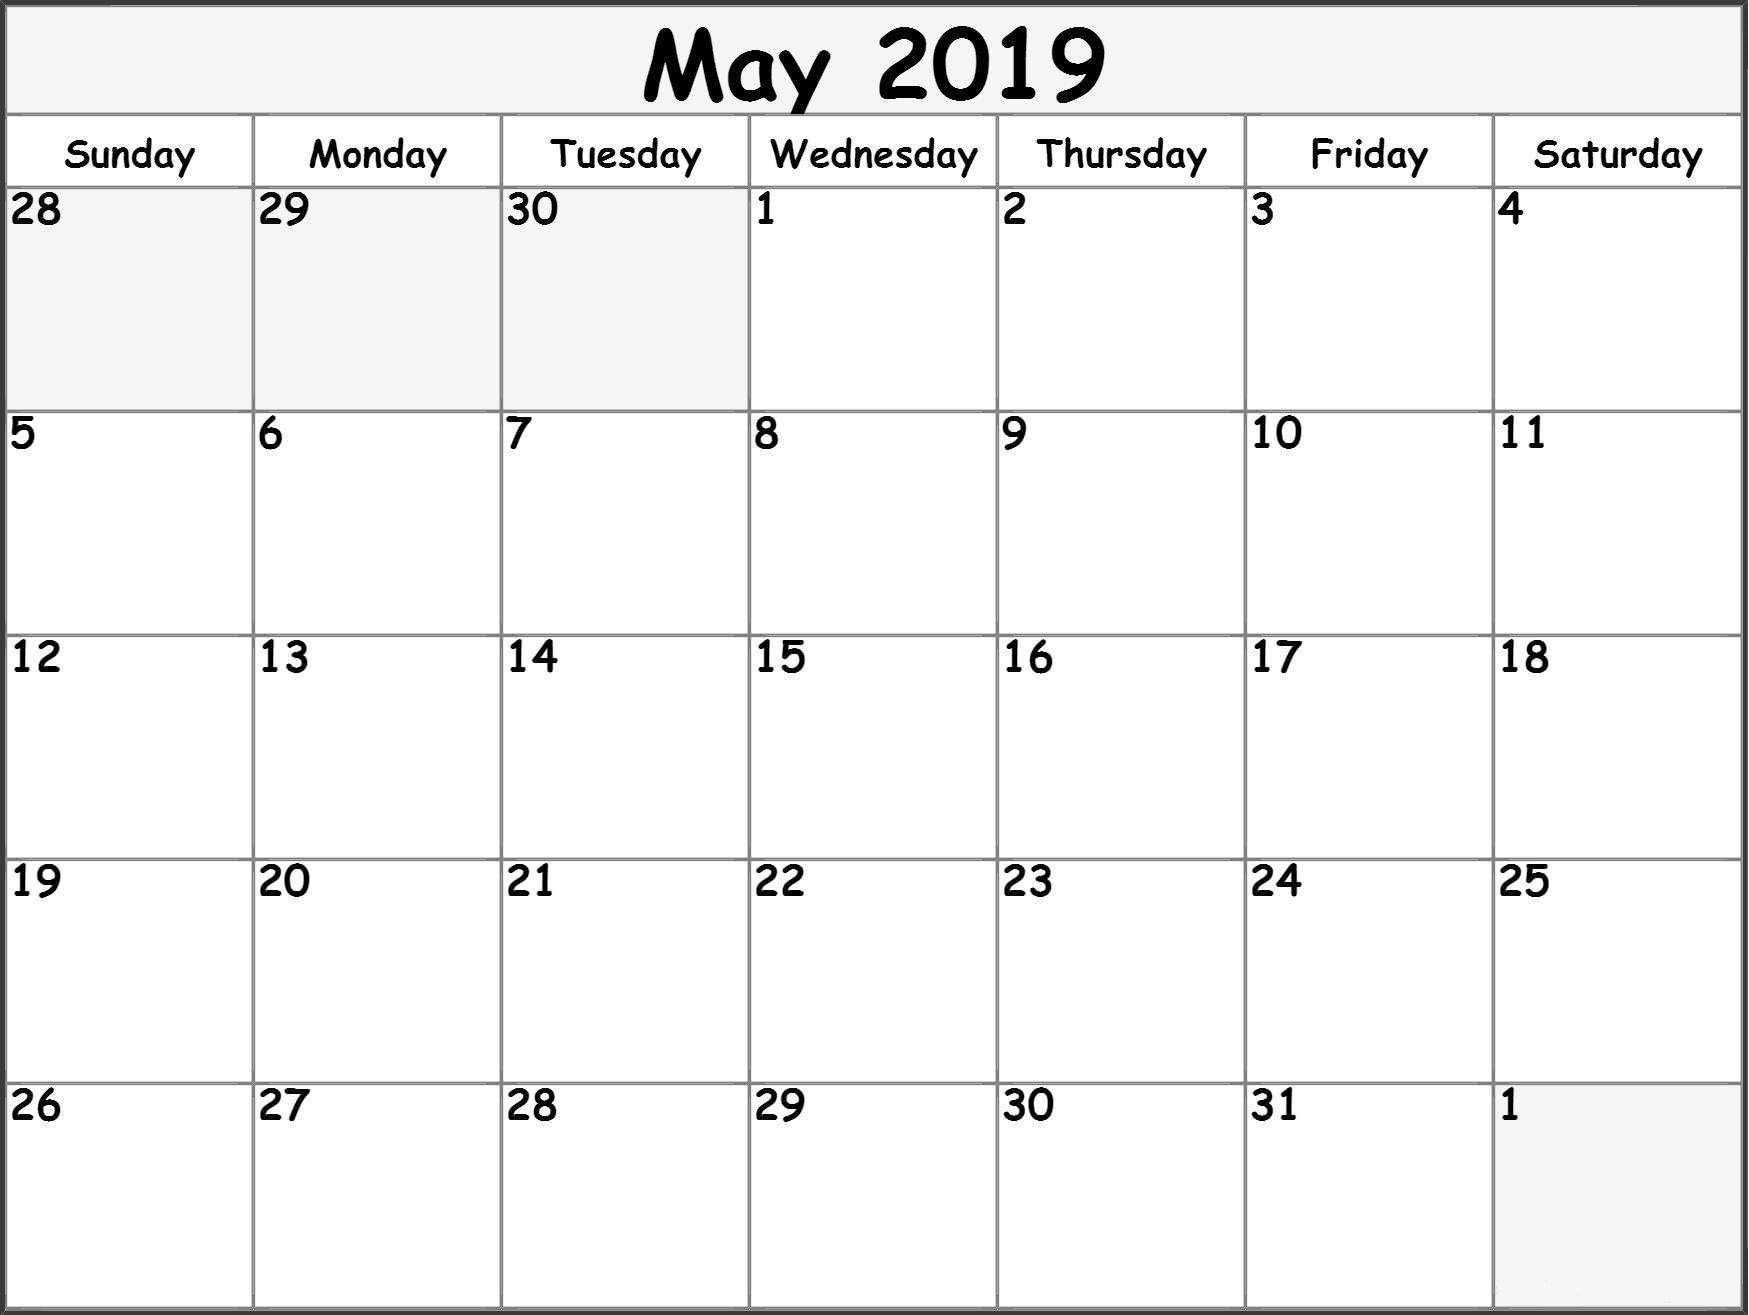 May 2019 Printable Calendar Templates - Free Blank, Pdf, Holidays with Calendar With Holidays Printable Templates